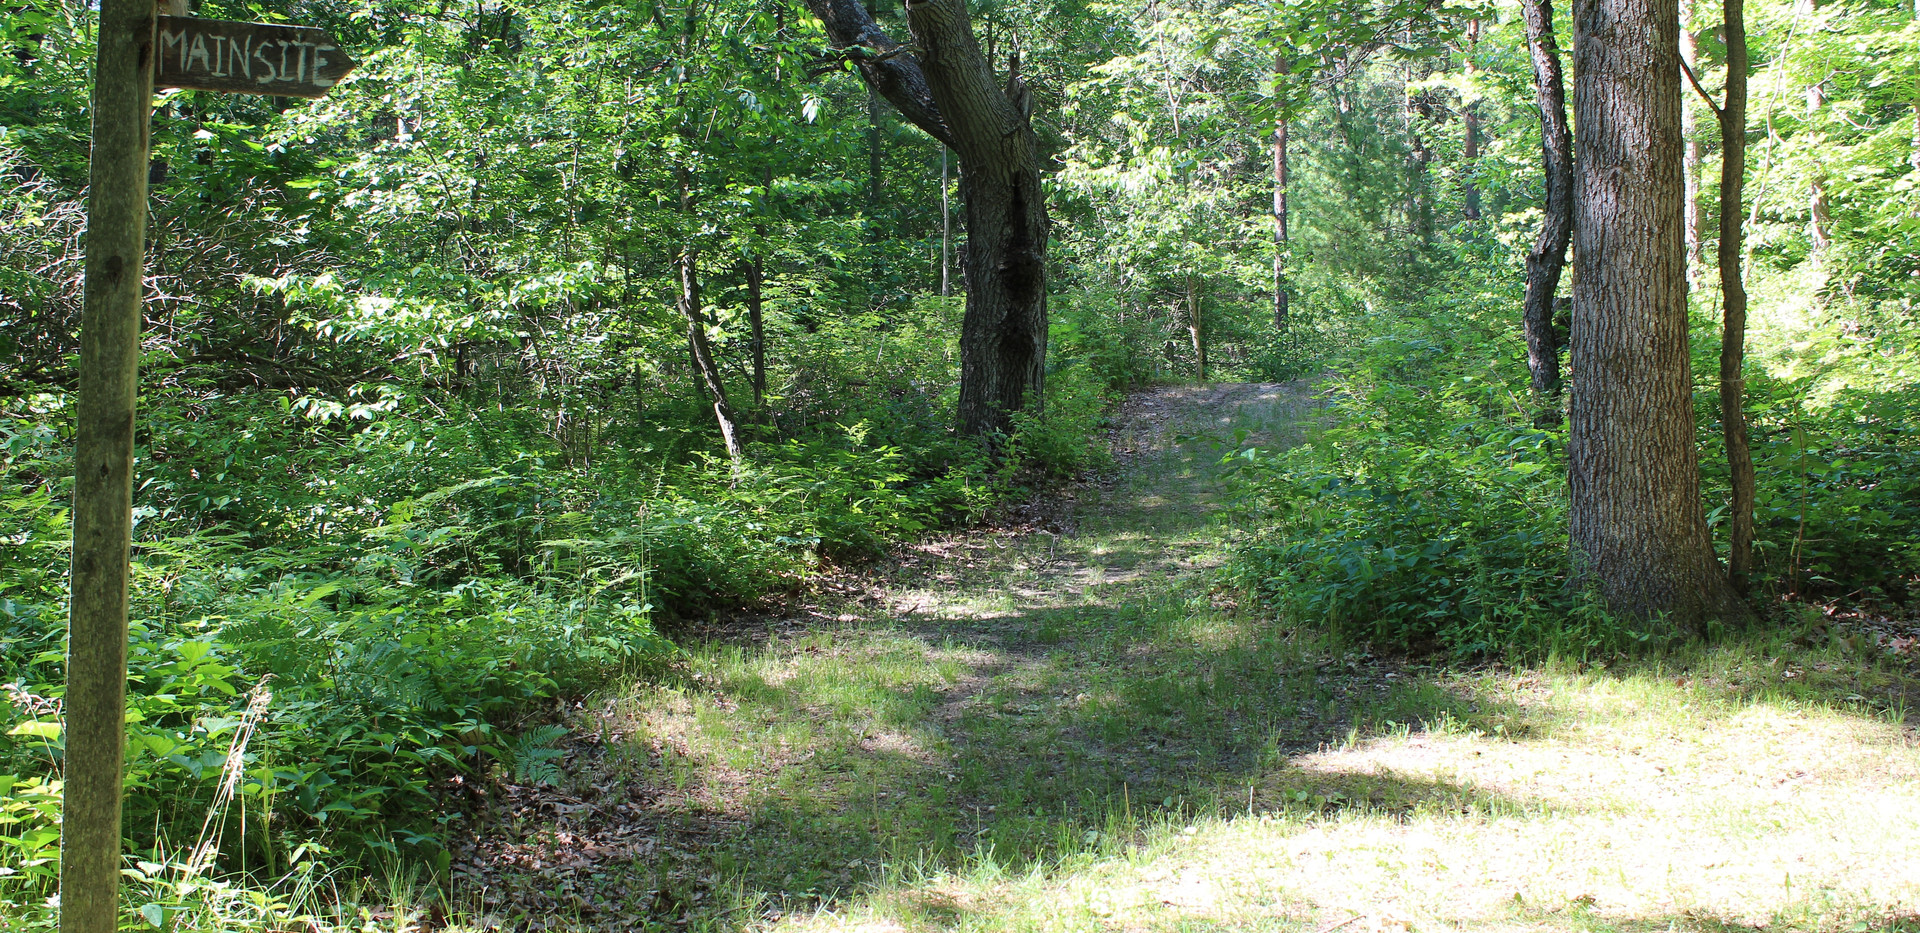 More Trails